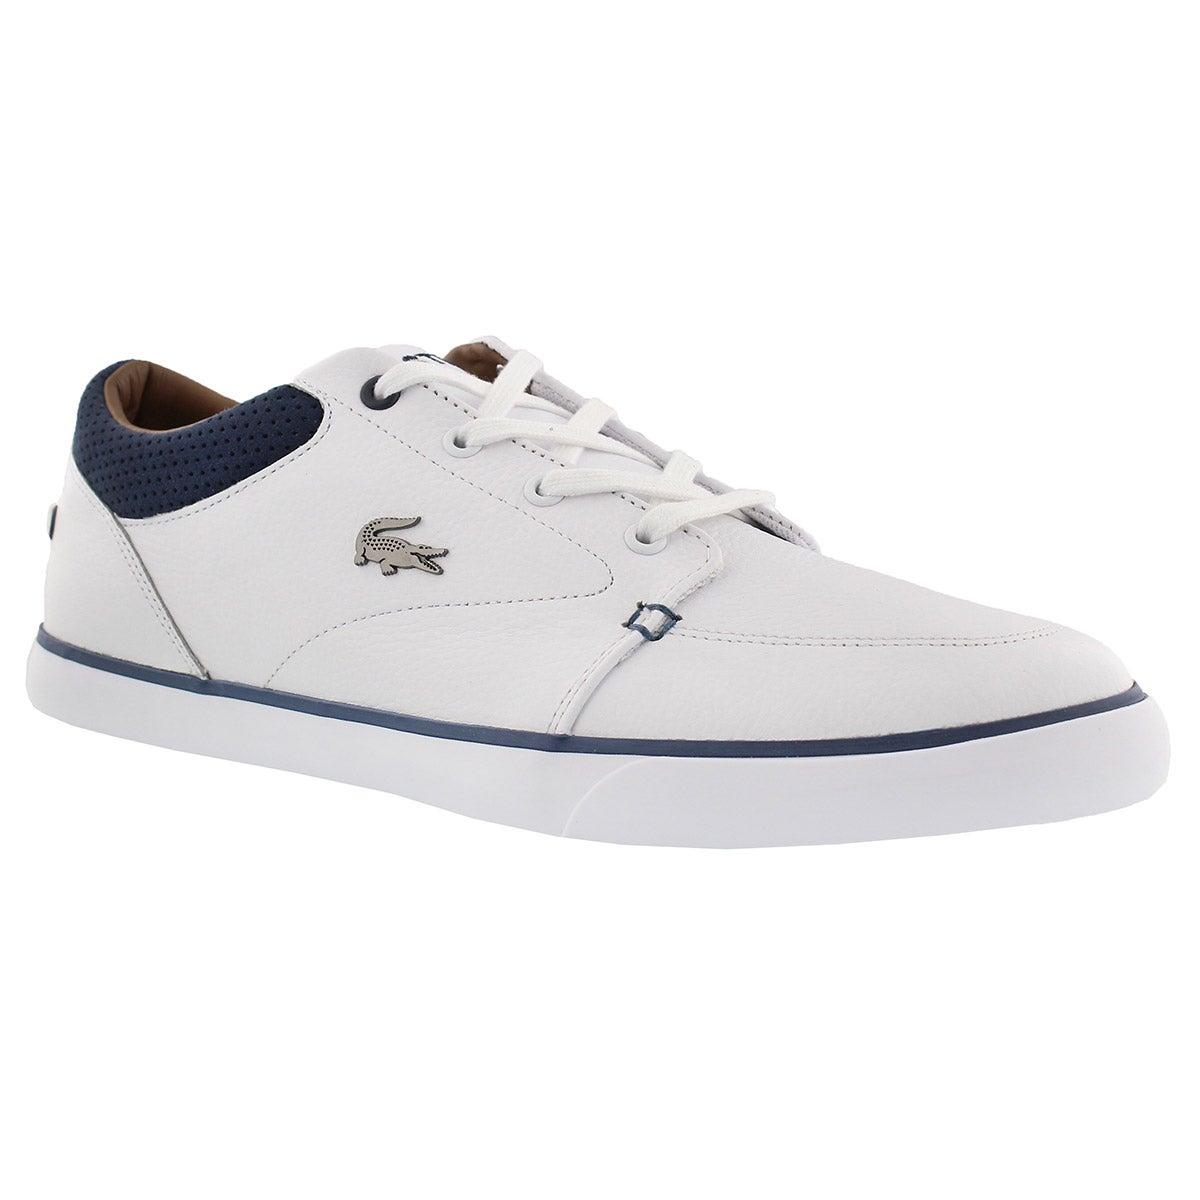 Men's BAYLISS VULC 317 white/blue sneakers